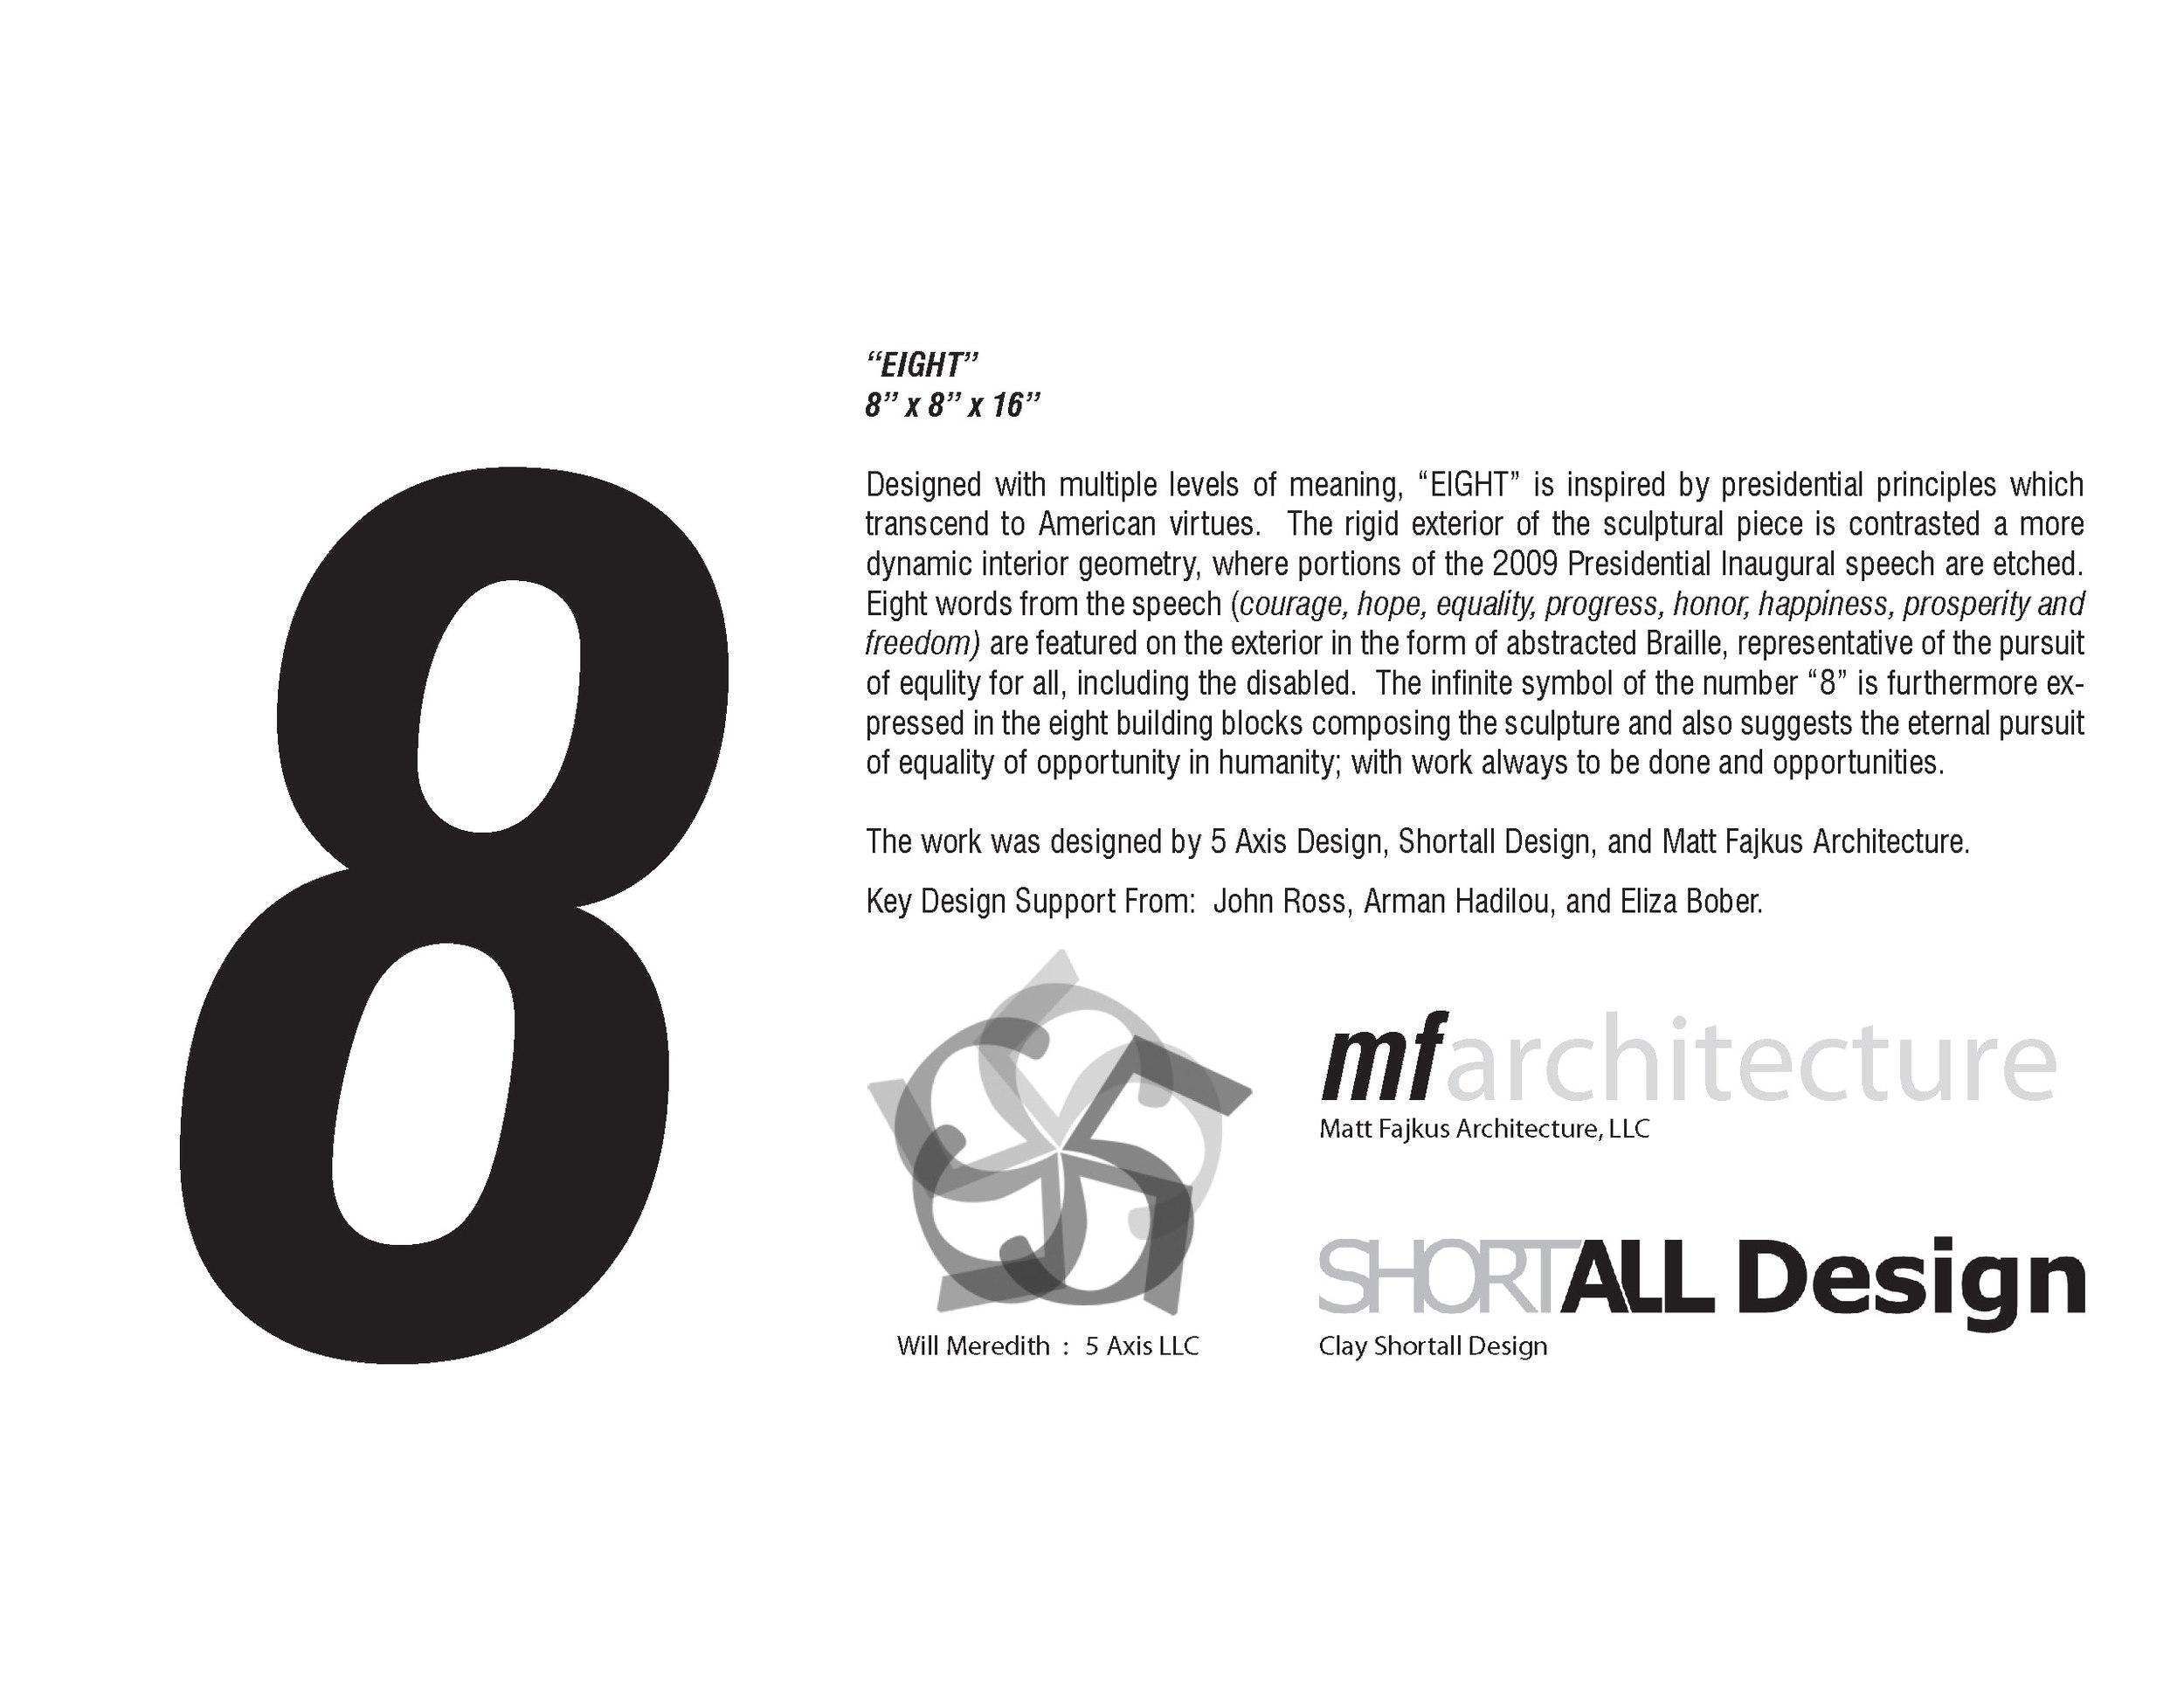 2014_0321 Matt Fajkus MF Architecture Presidential Sculpture_Page_1.jpg